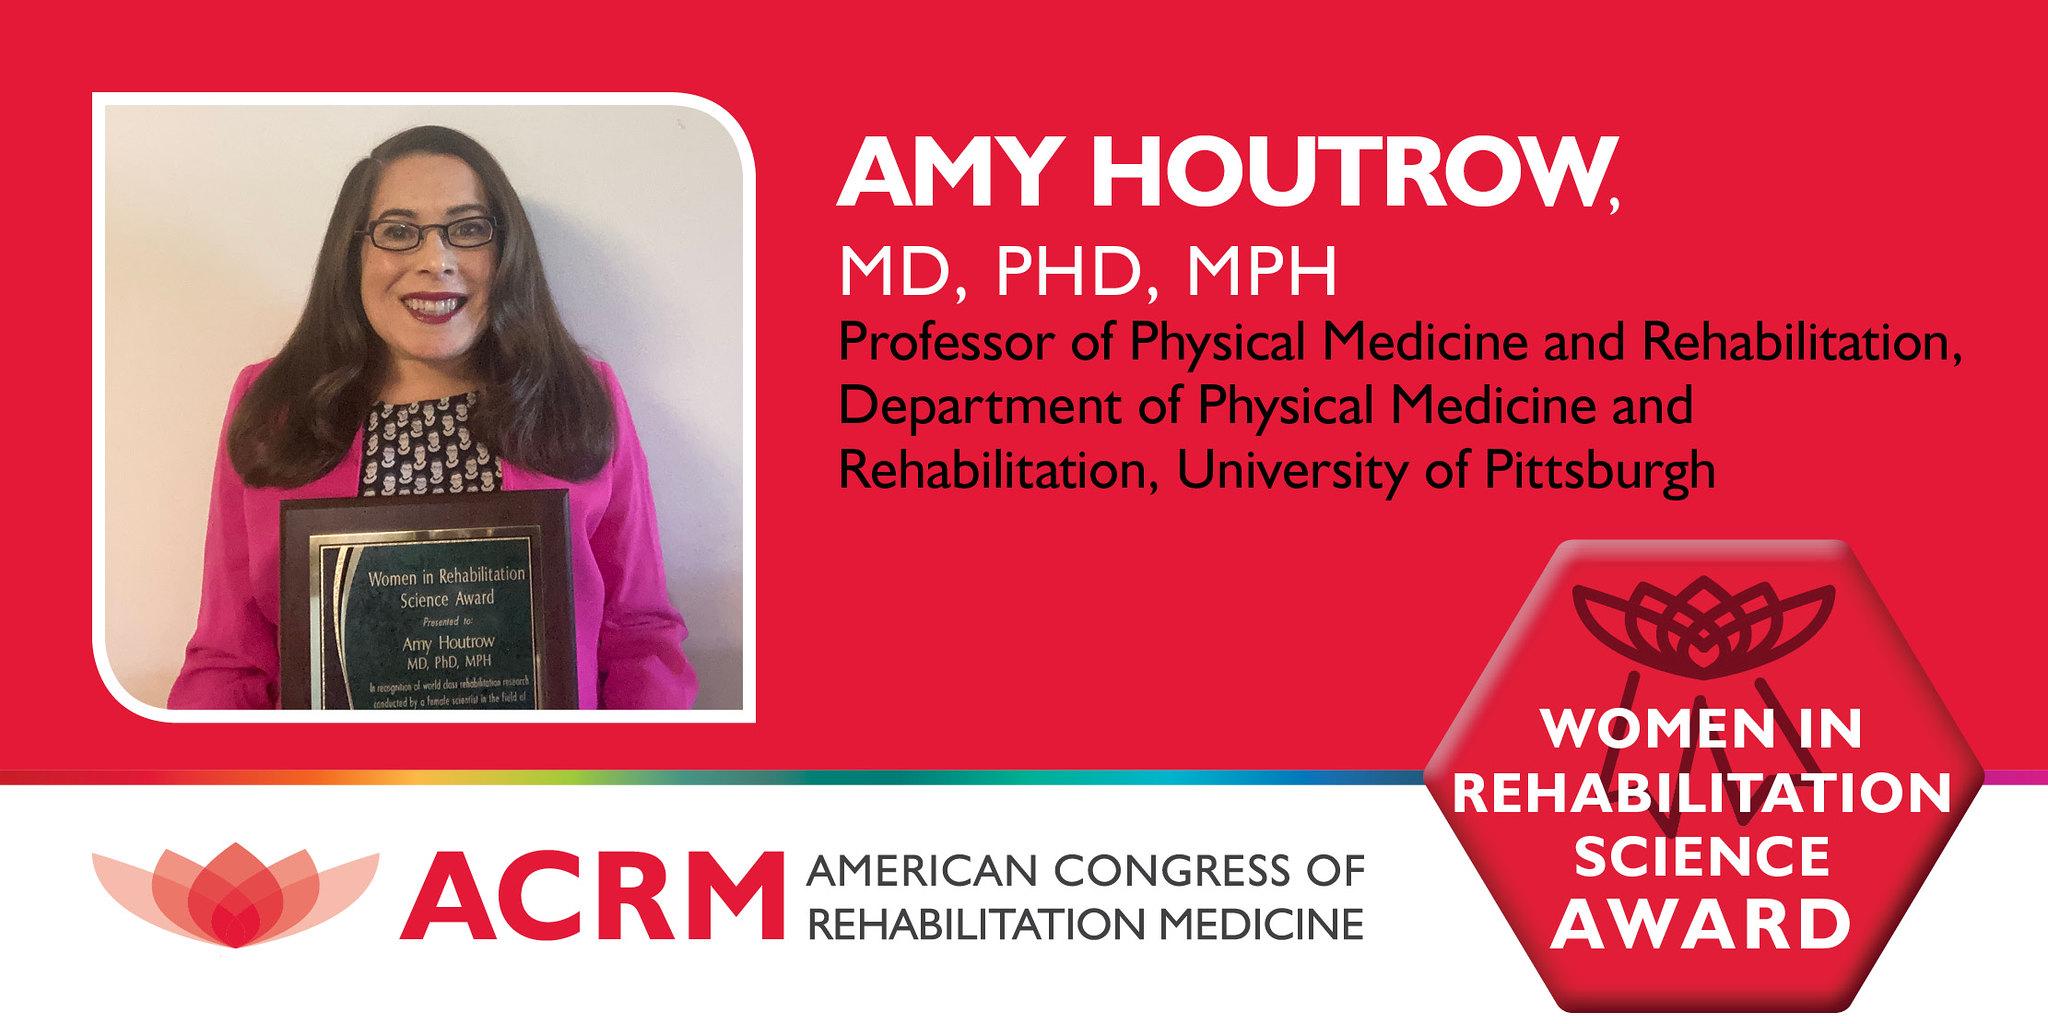 ACRM 2020 Women in Rehabilitation Science Award presentation image